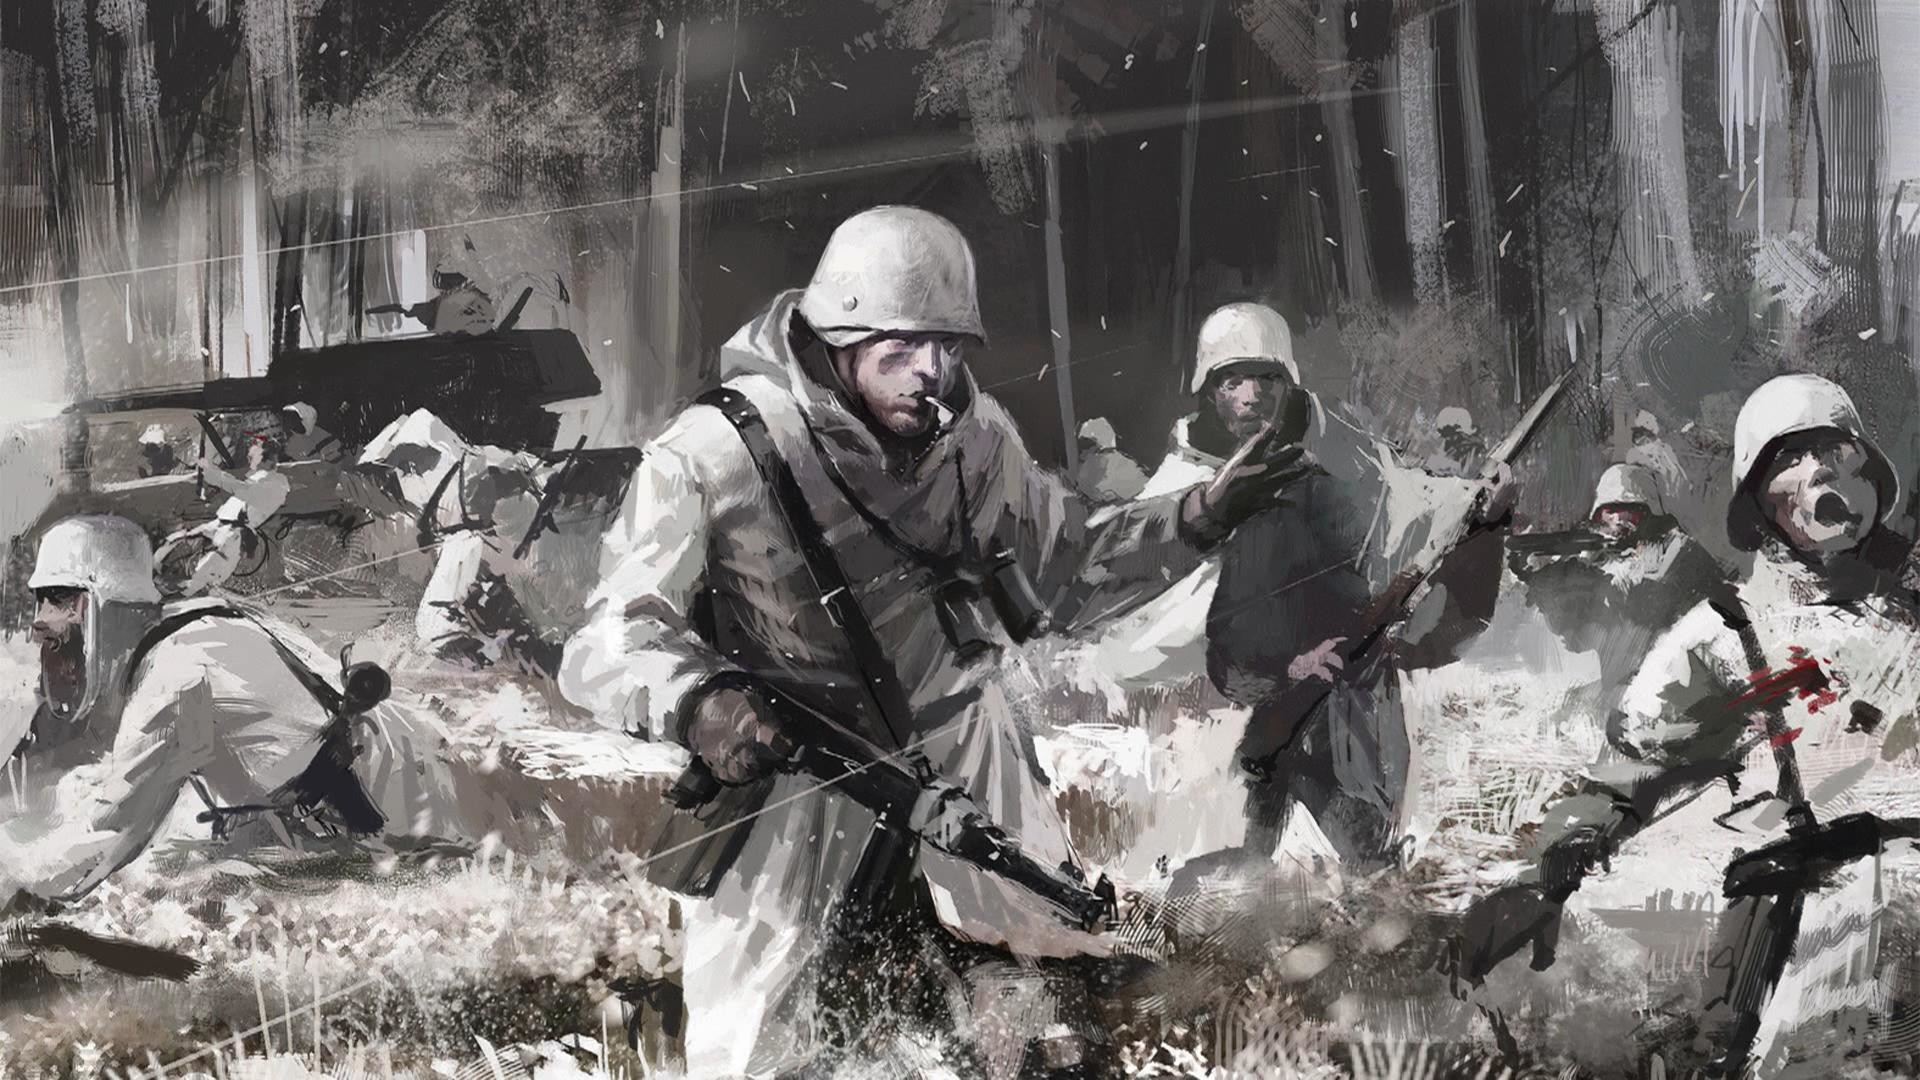 German Army Ww2 Wallpaper Report media world war 2